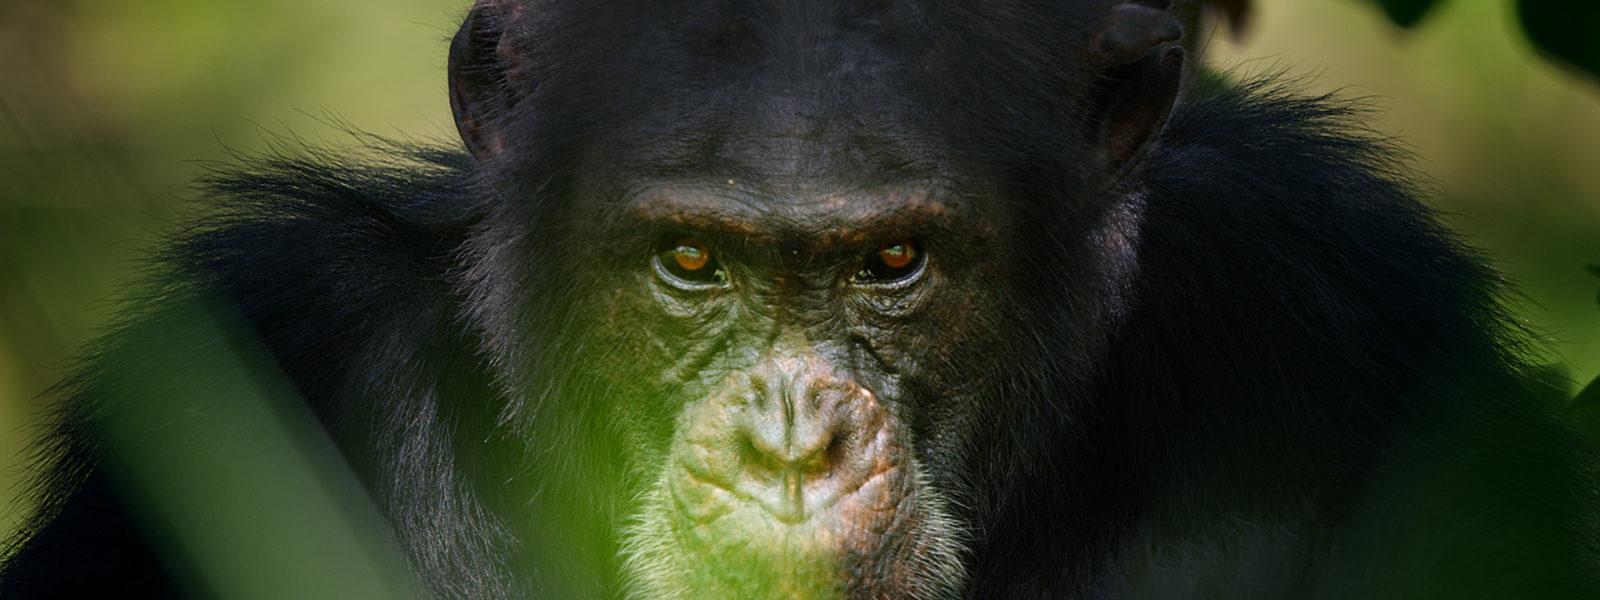 Chimpanzee_1920x1080